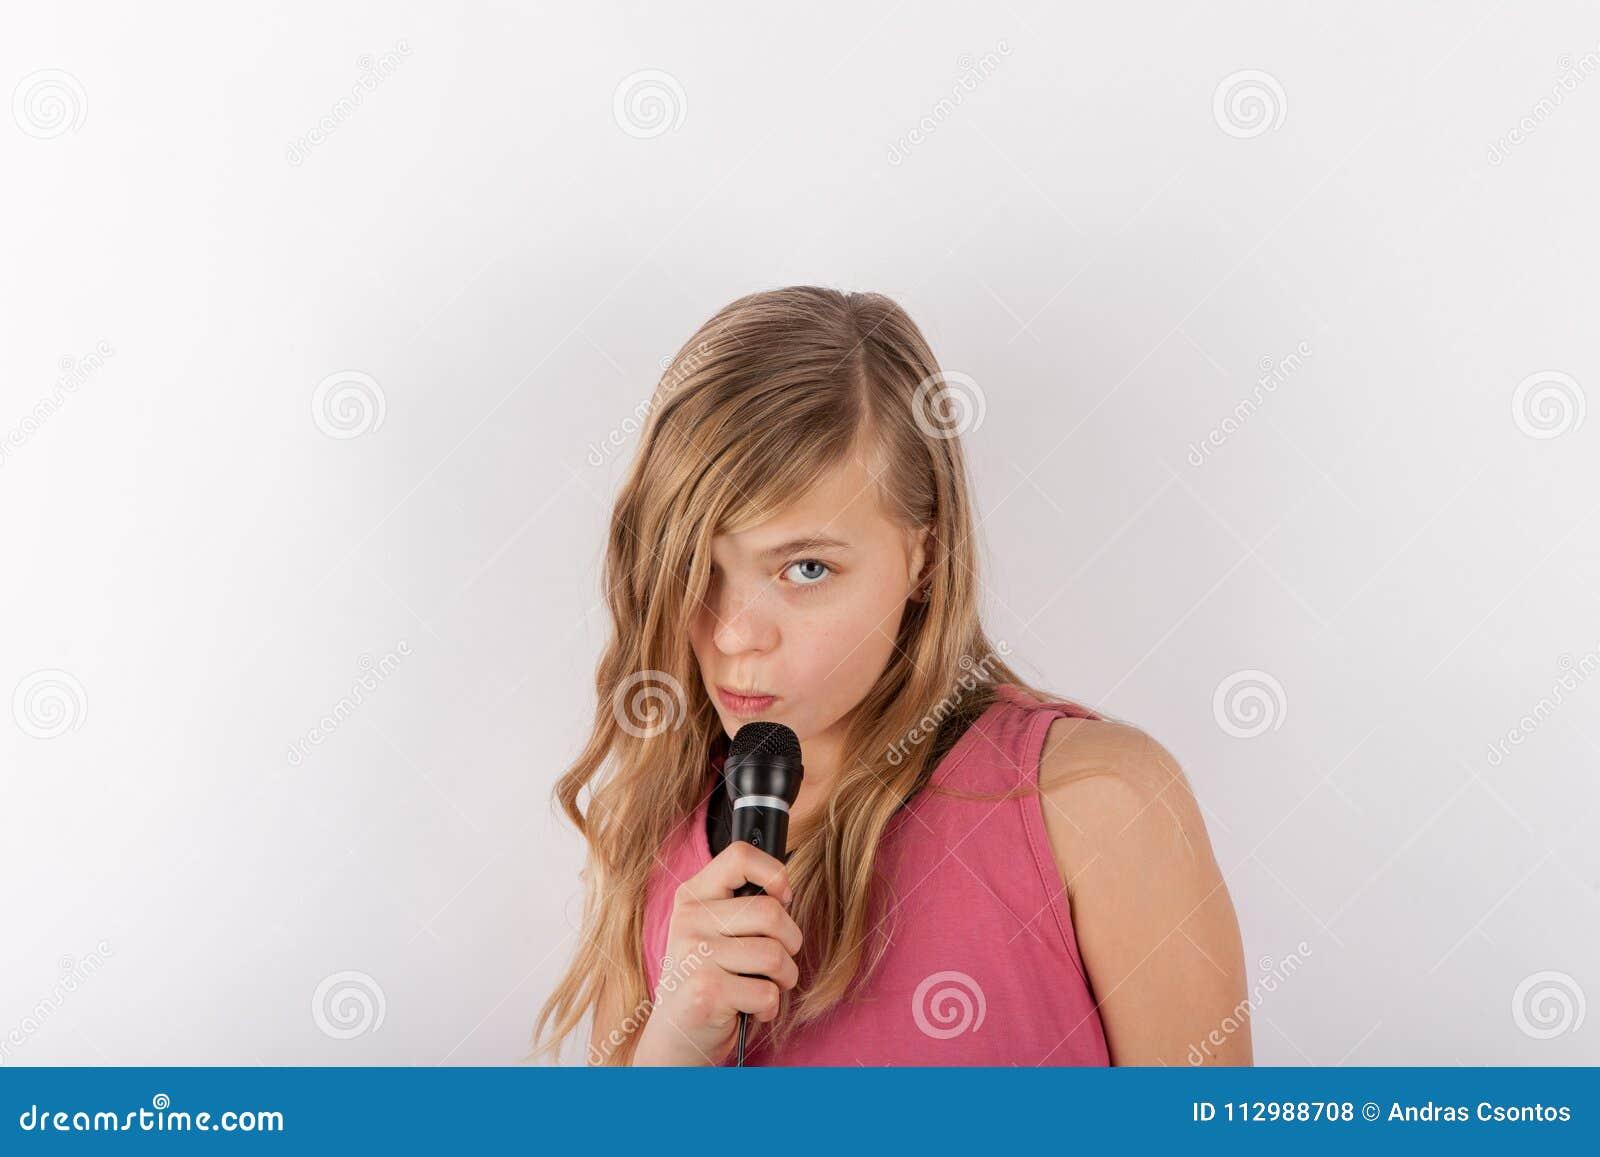 Young cute girl holding a microphone singing karaoke